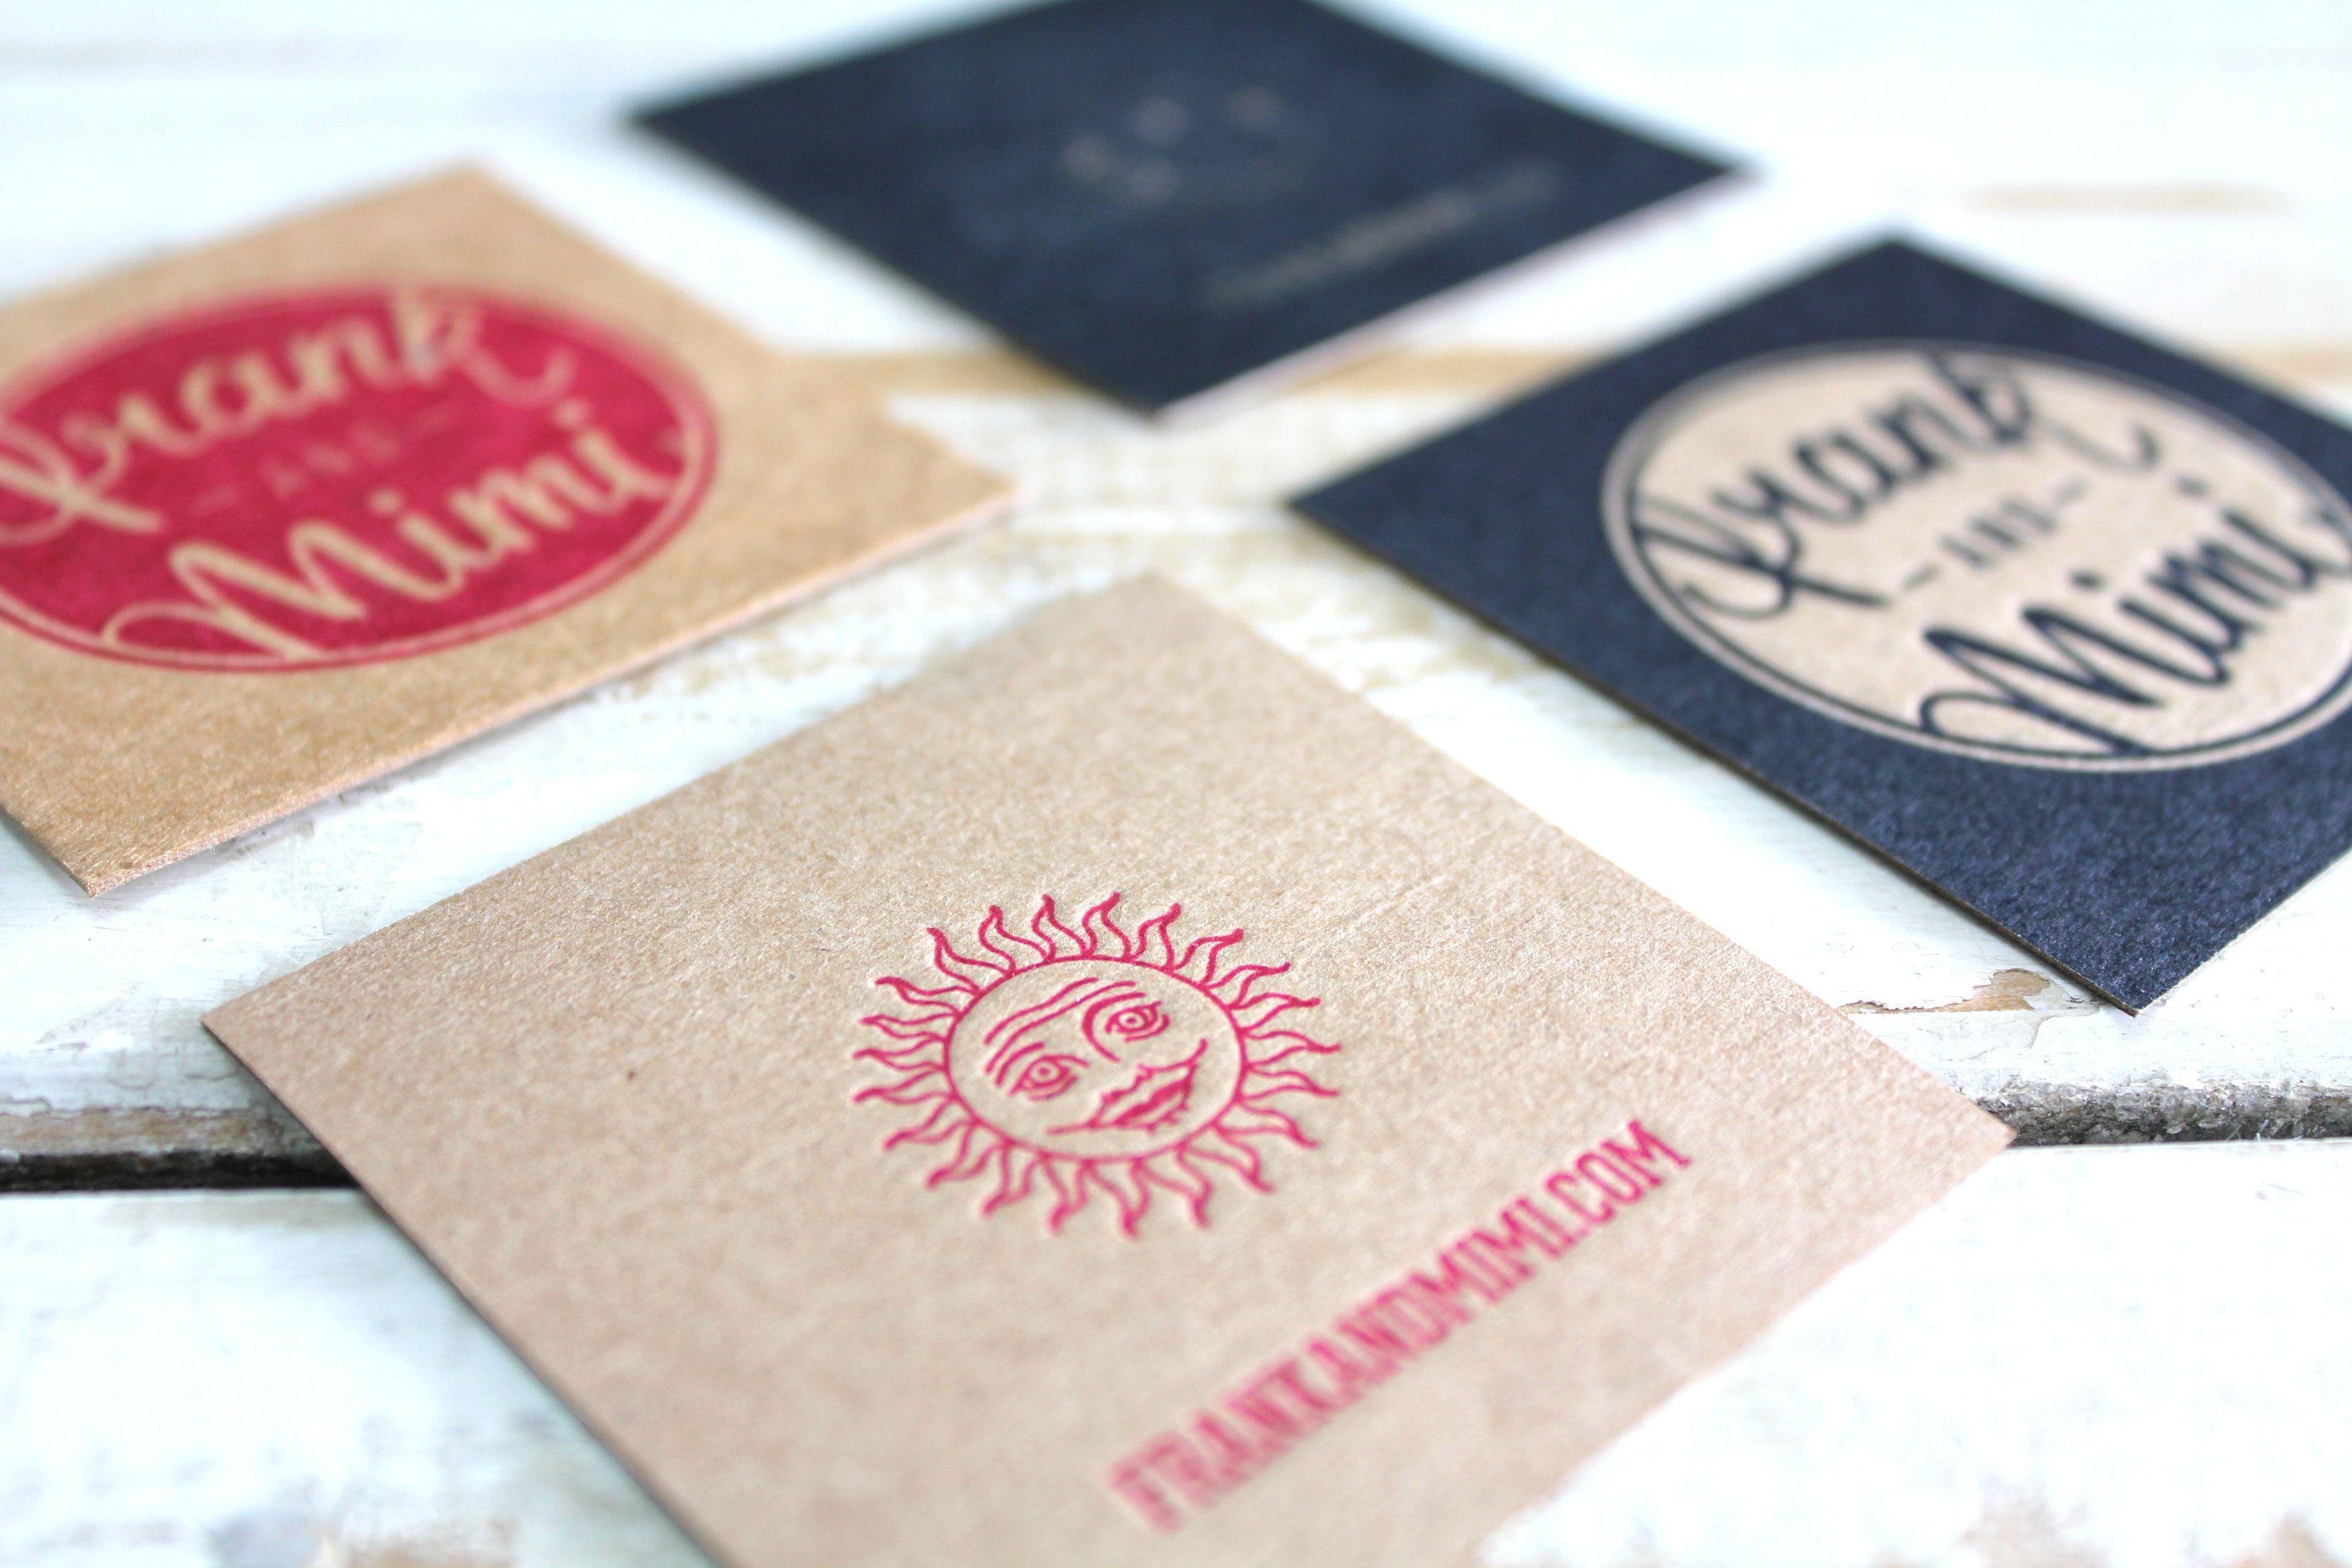 Little peach frank mimi letterpress a couple honorable little peach frank mimi letterpress business cardspeachtypofontslipsense reheart Image collections